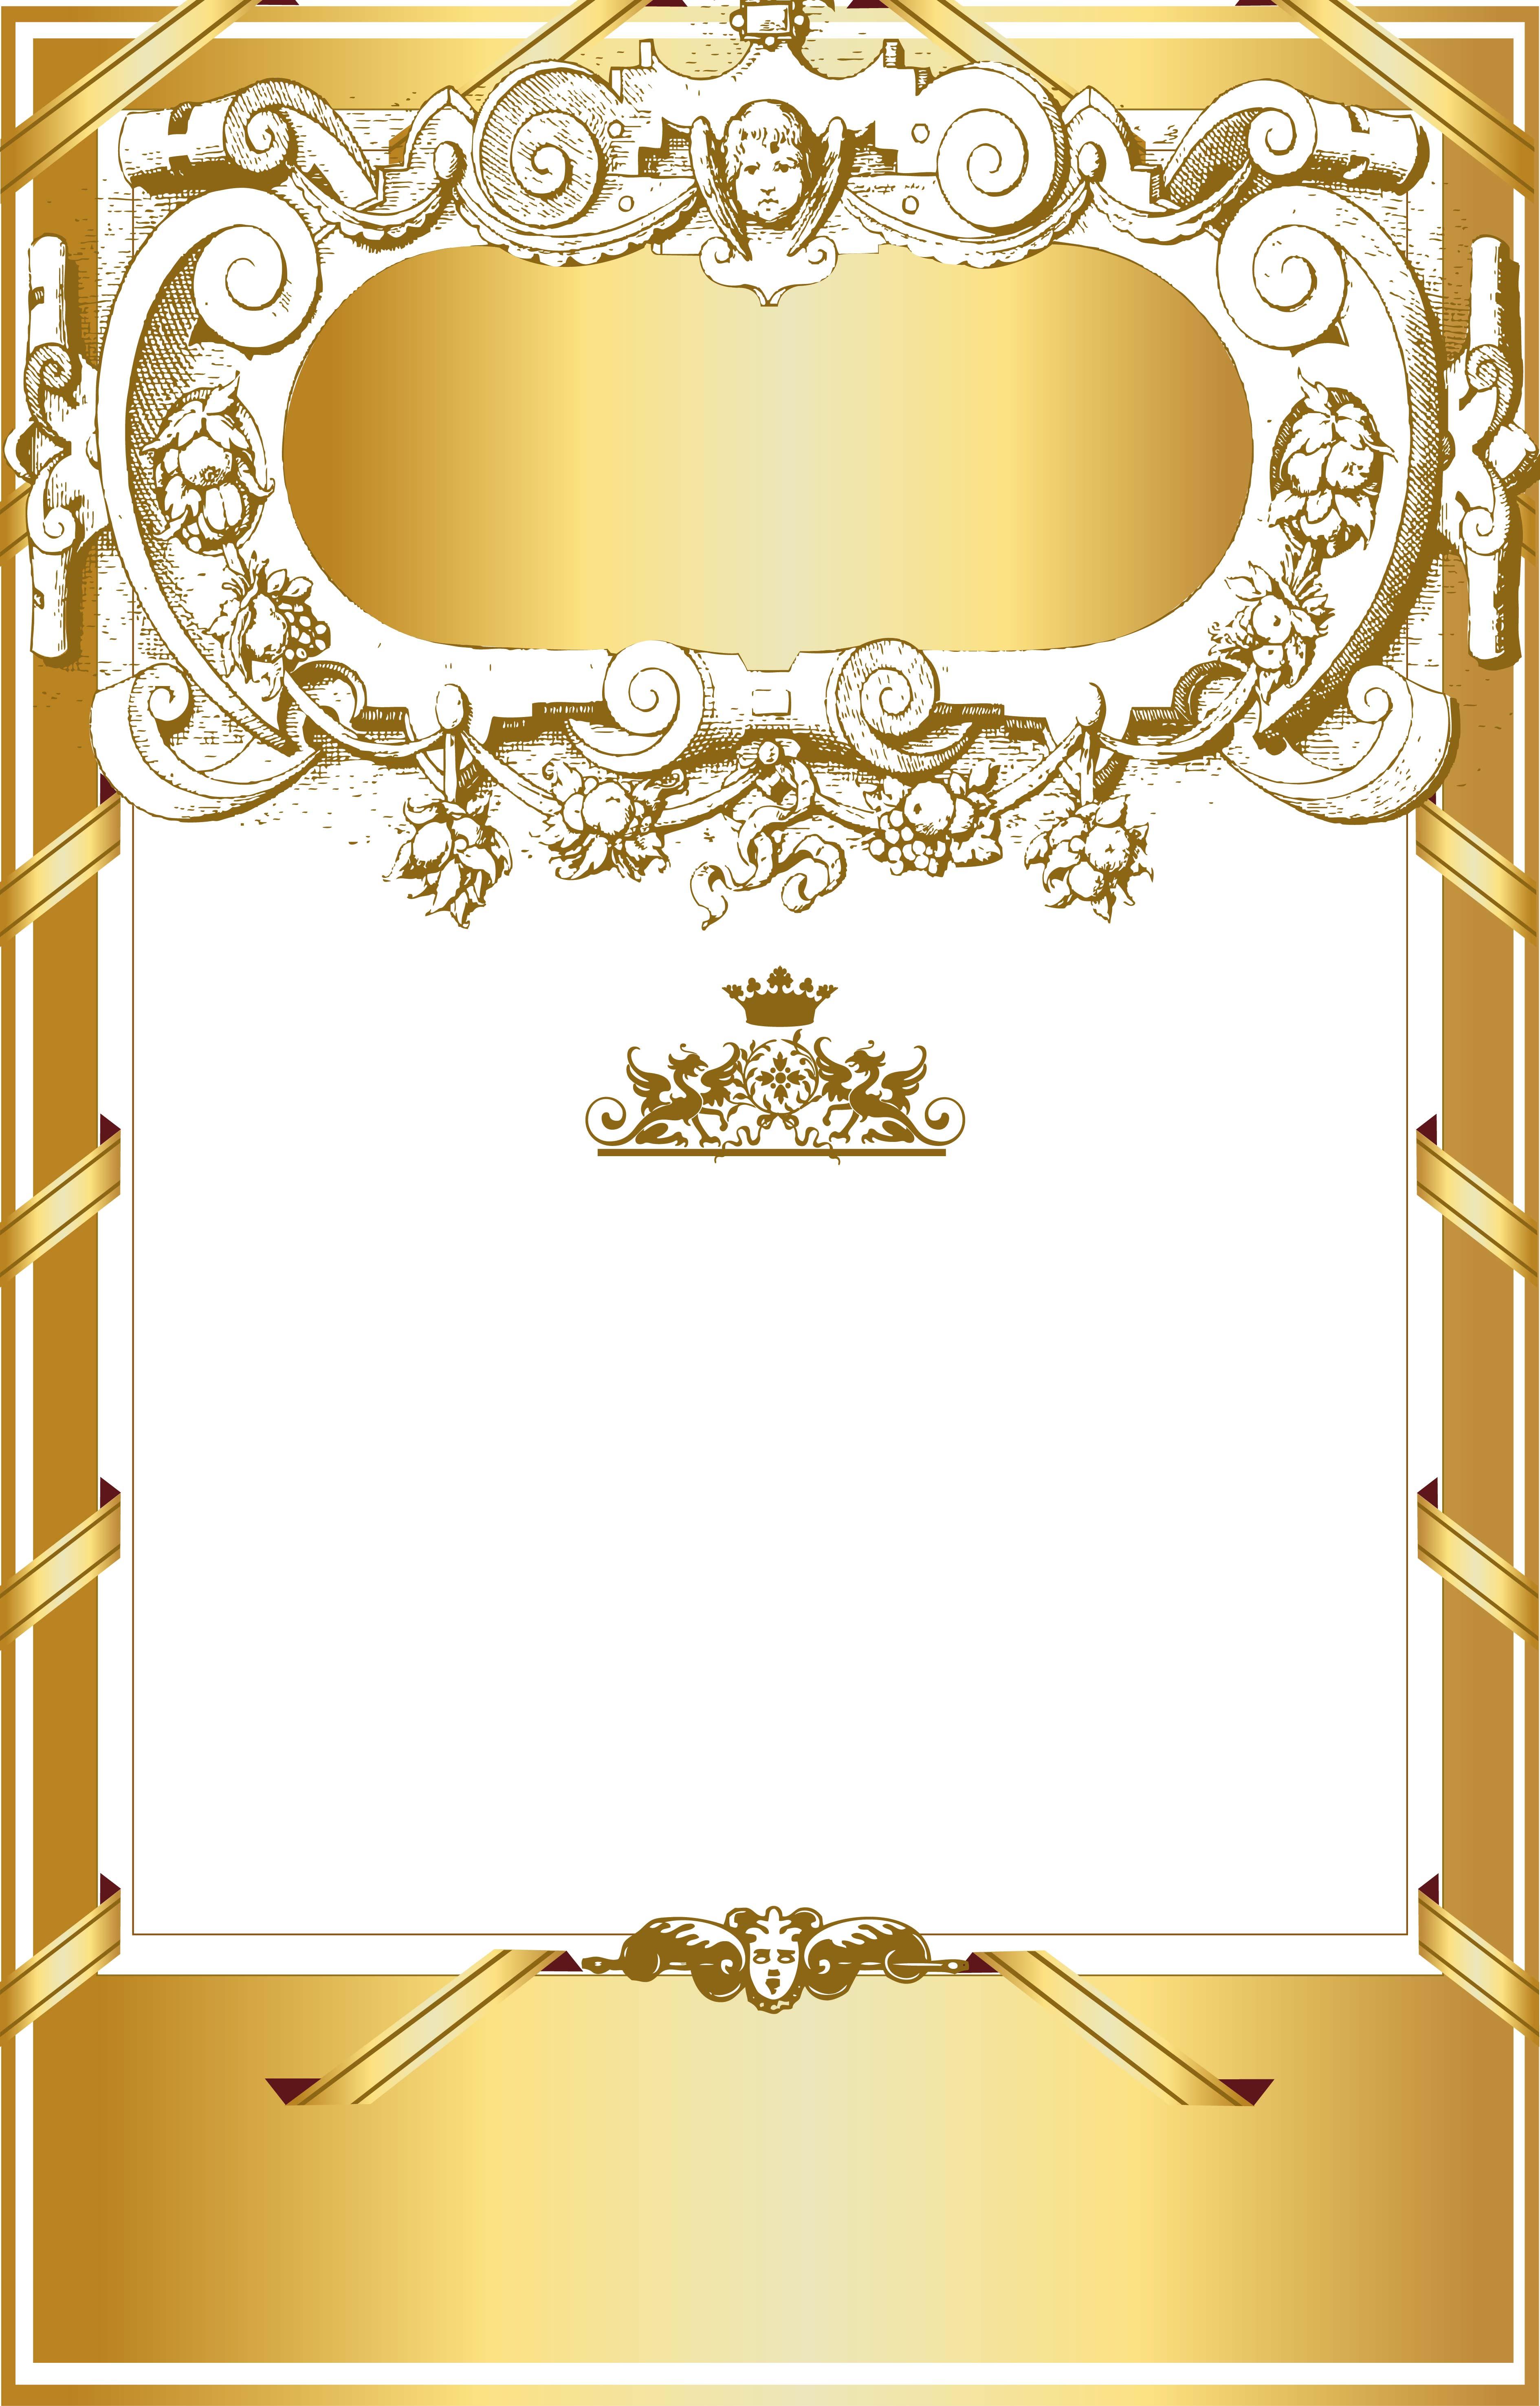 gold border pattern background material  pattern  frame